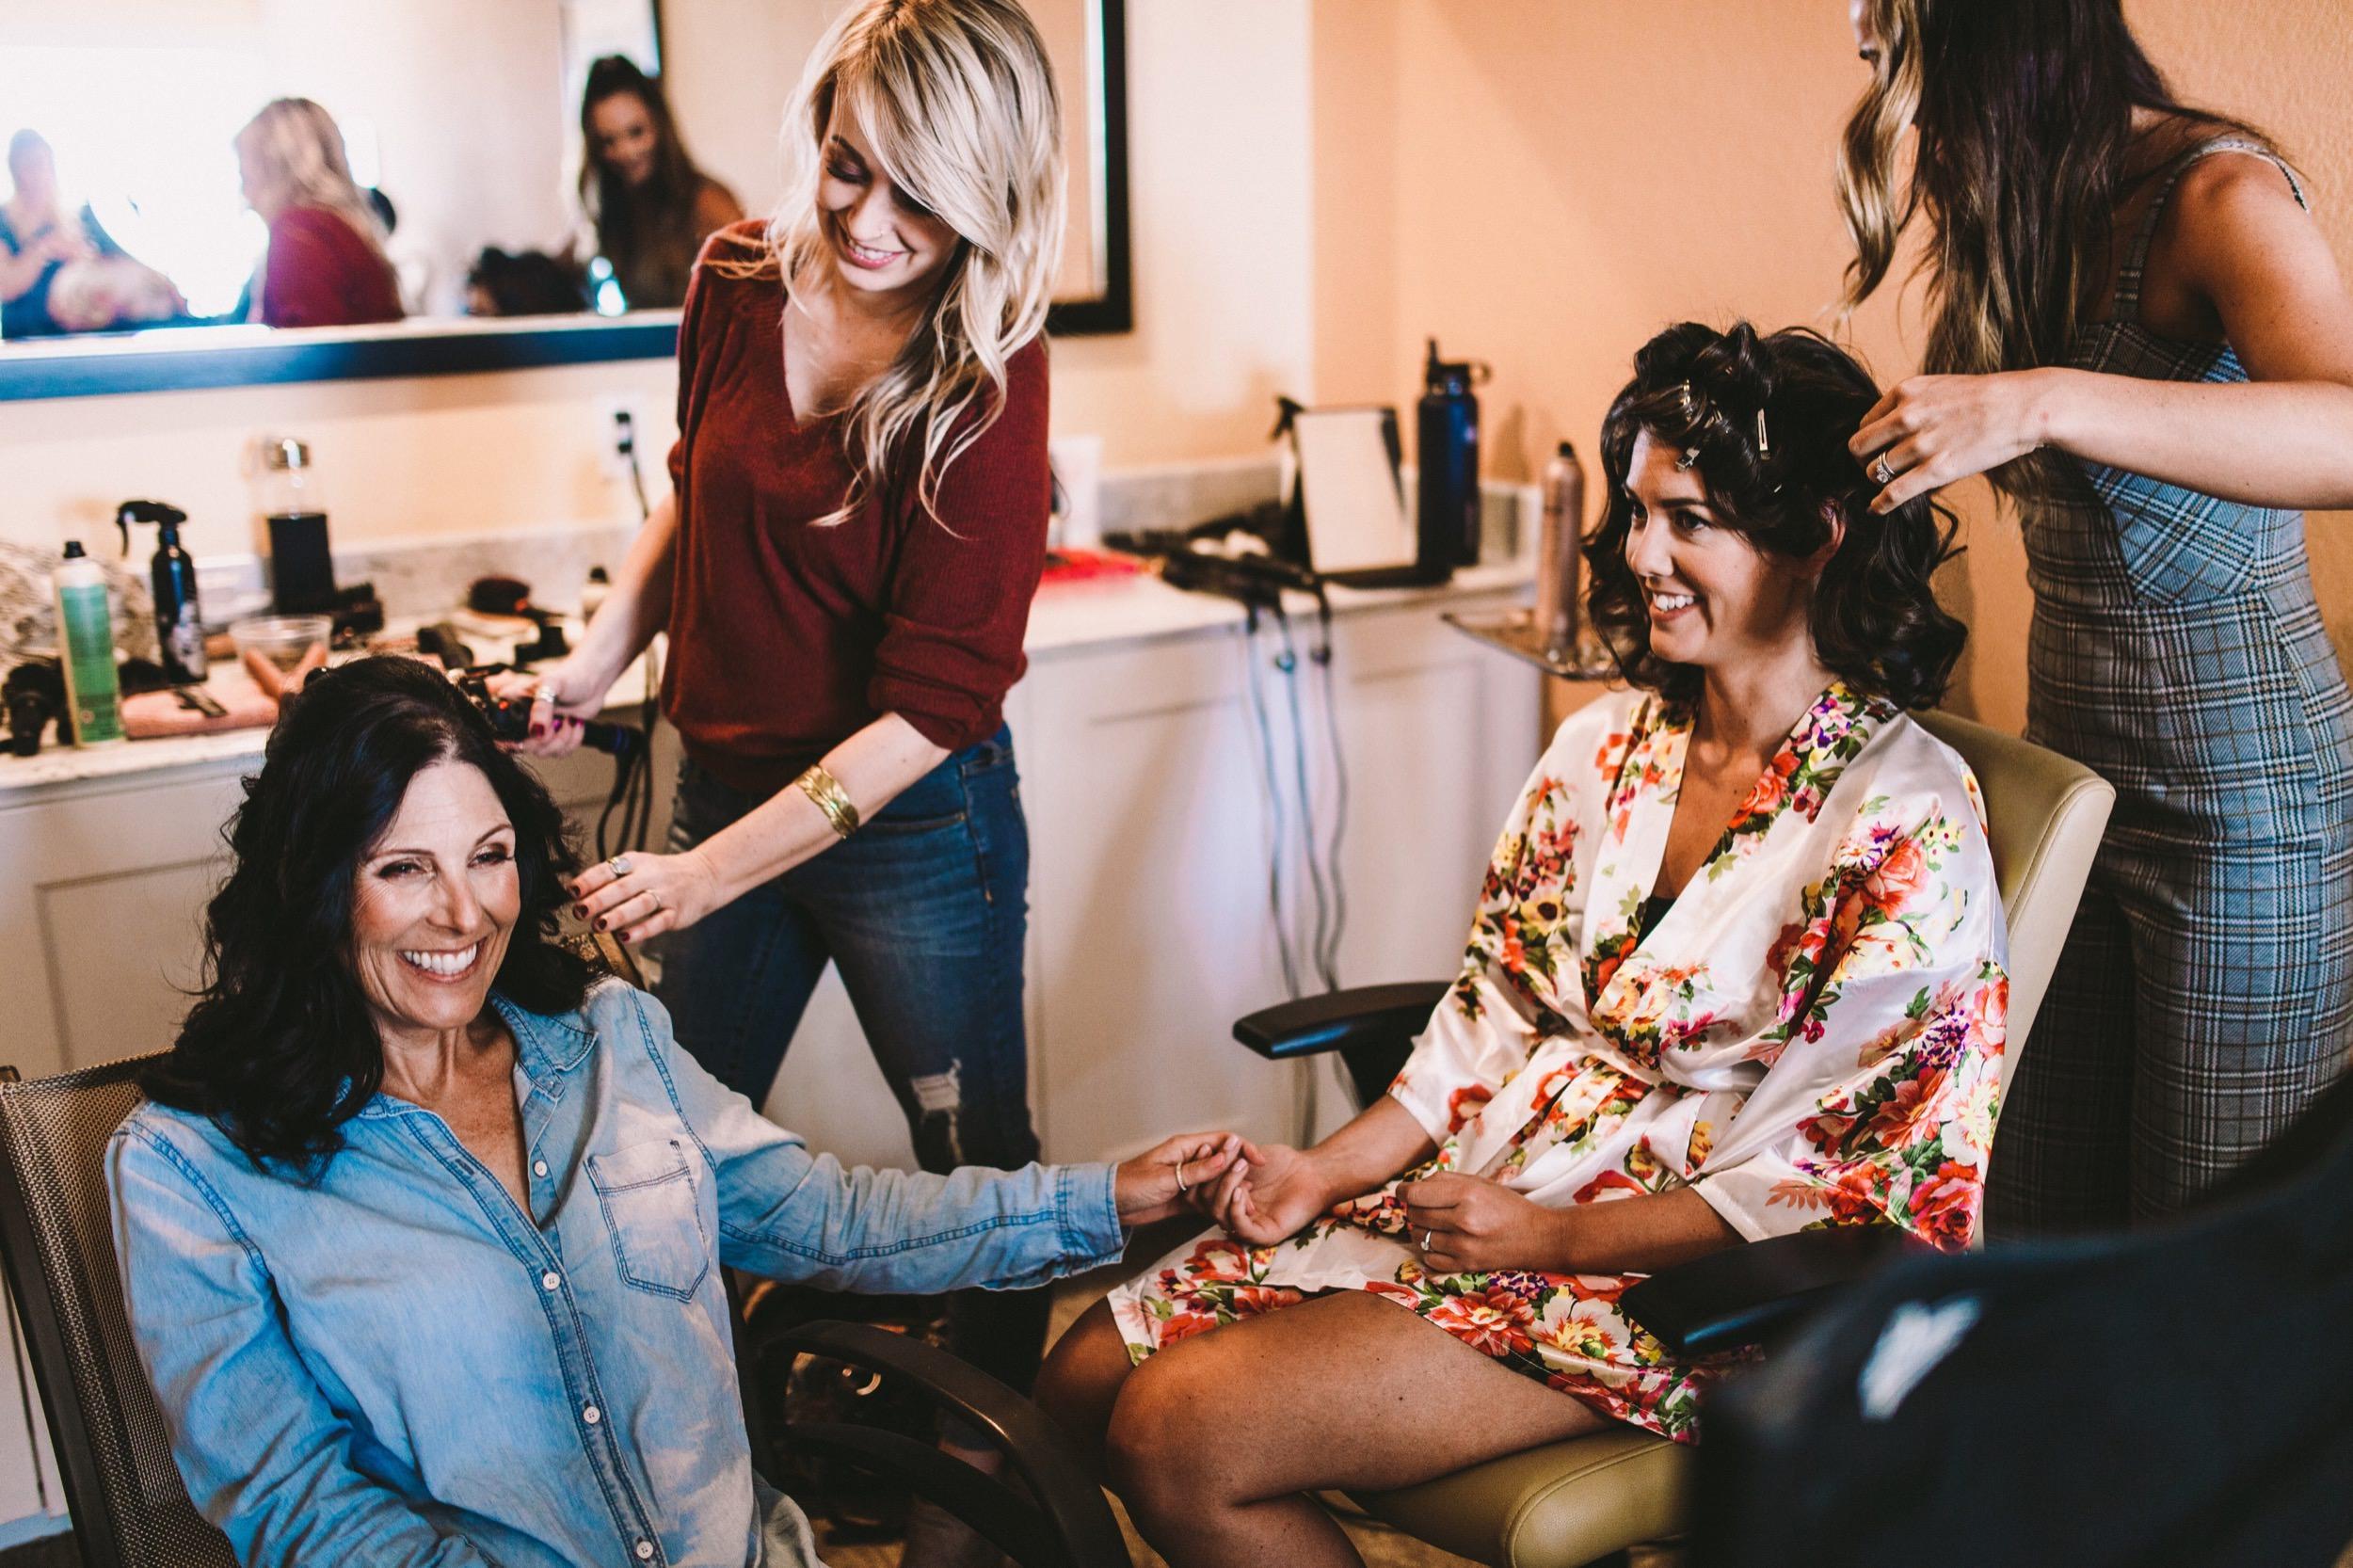 Leela Cobb Wedding Hair Stylist SoCal